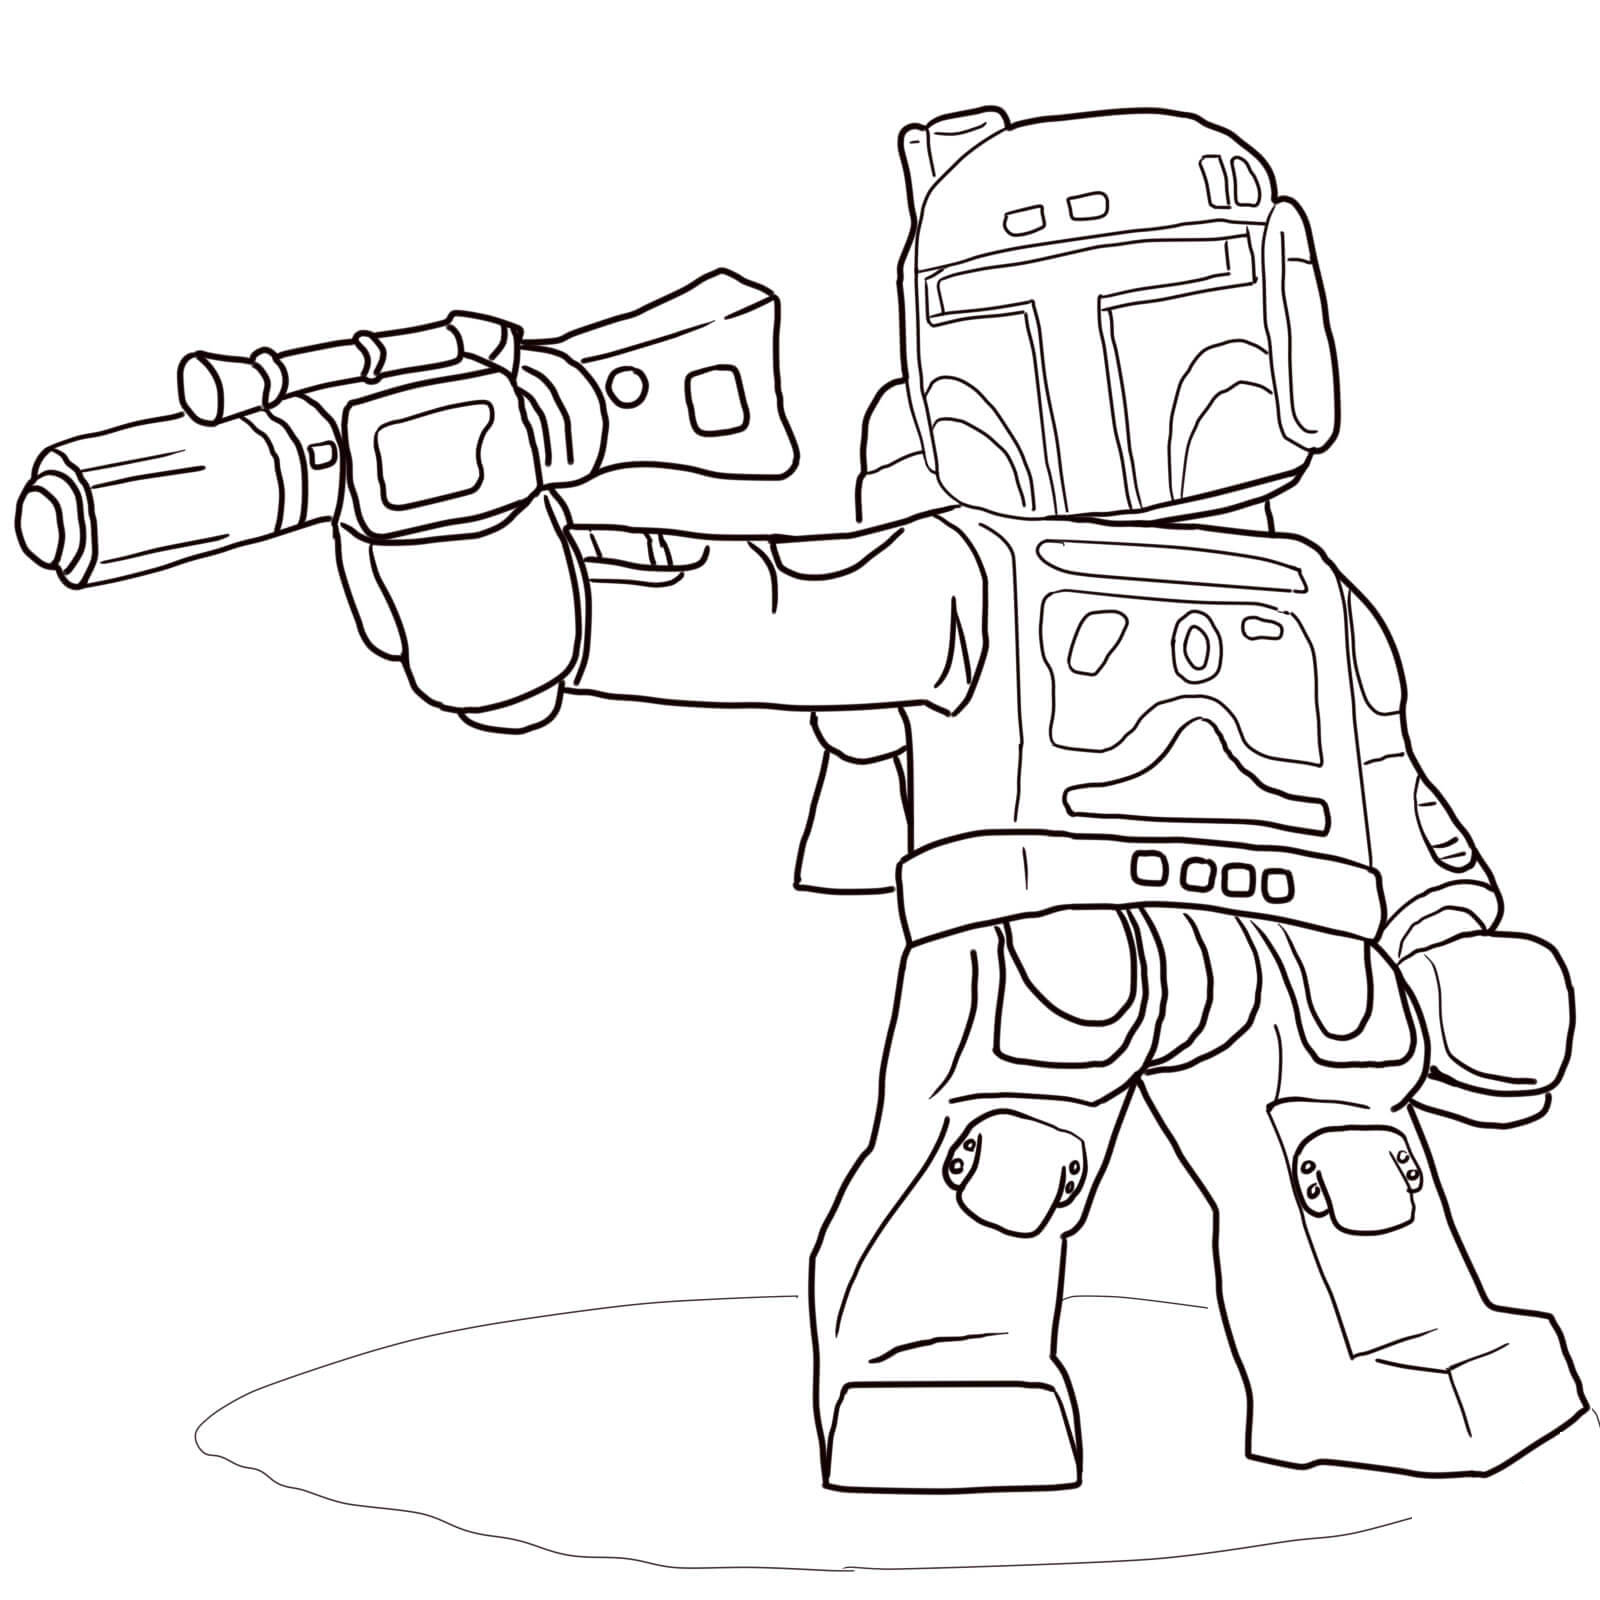 Boba Fett from Lego Star Wars